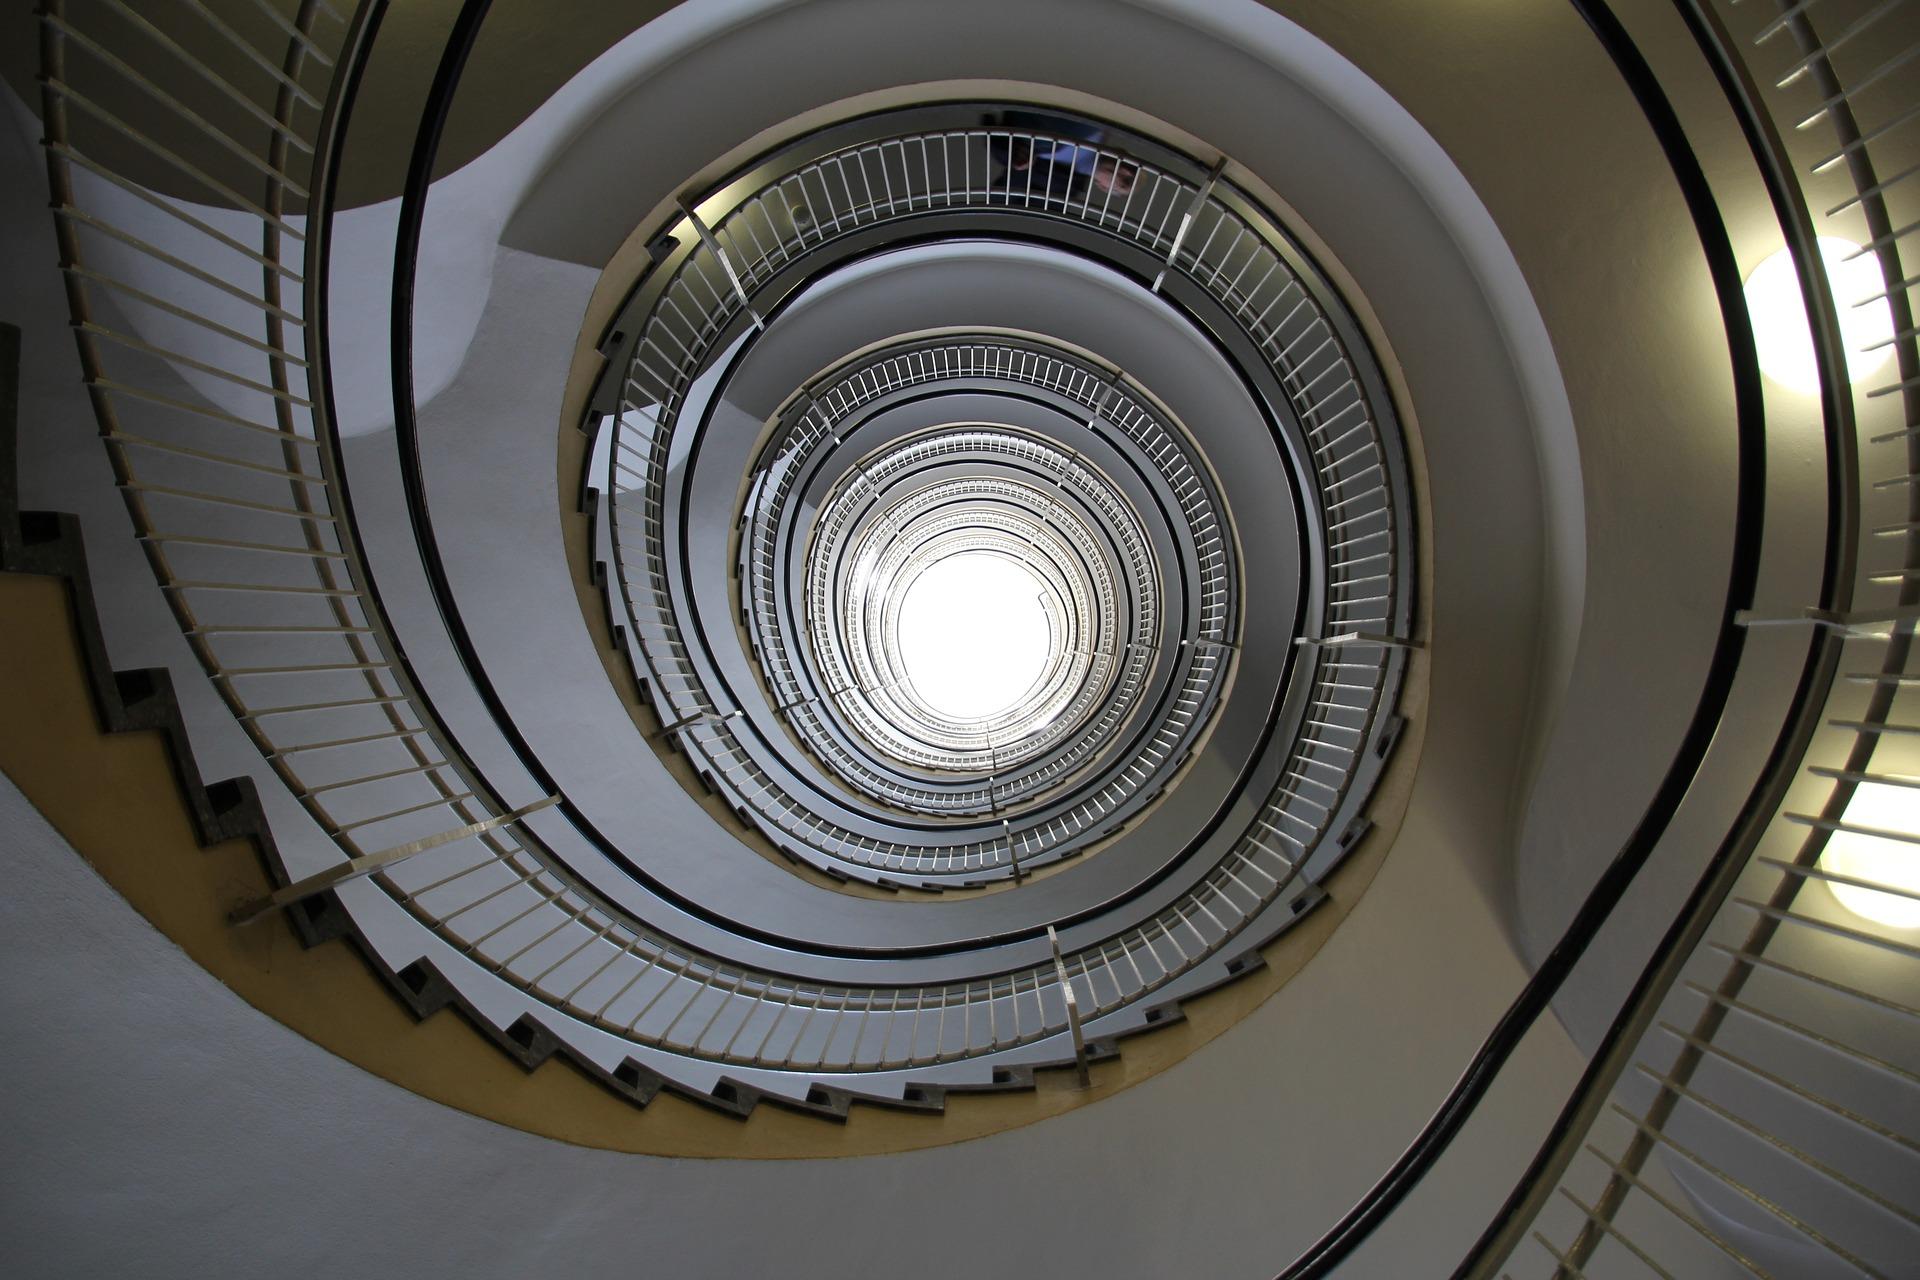 barierka na schody